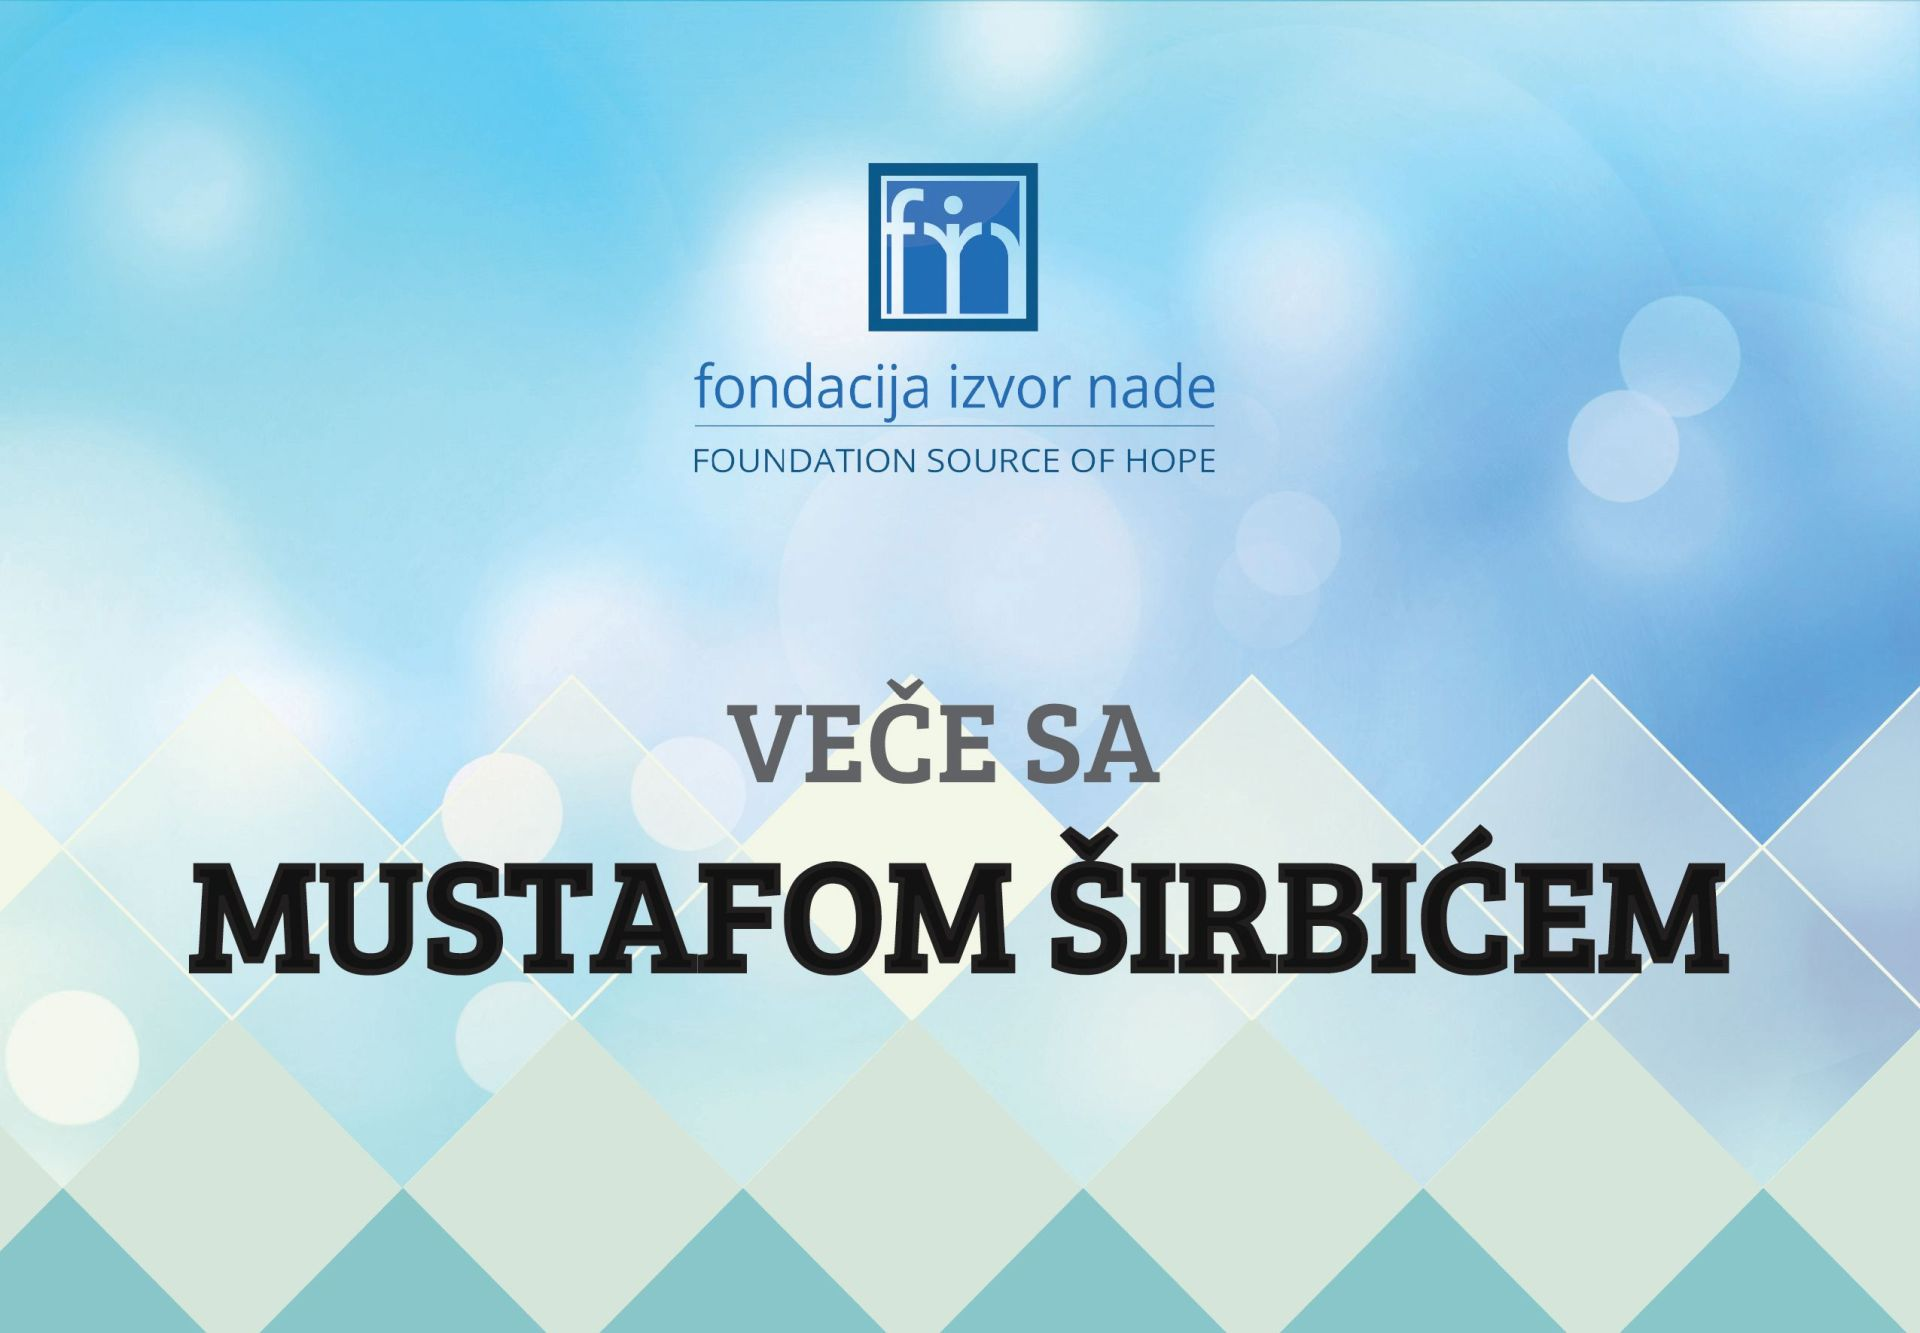 Vece sa Mustafom Sirbicem, Fondacija Izvor nade